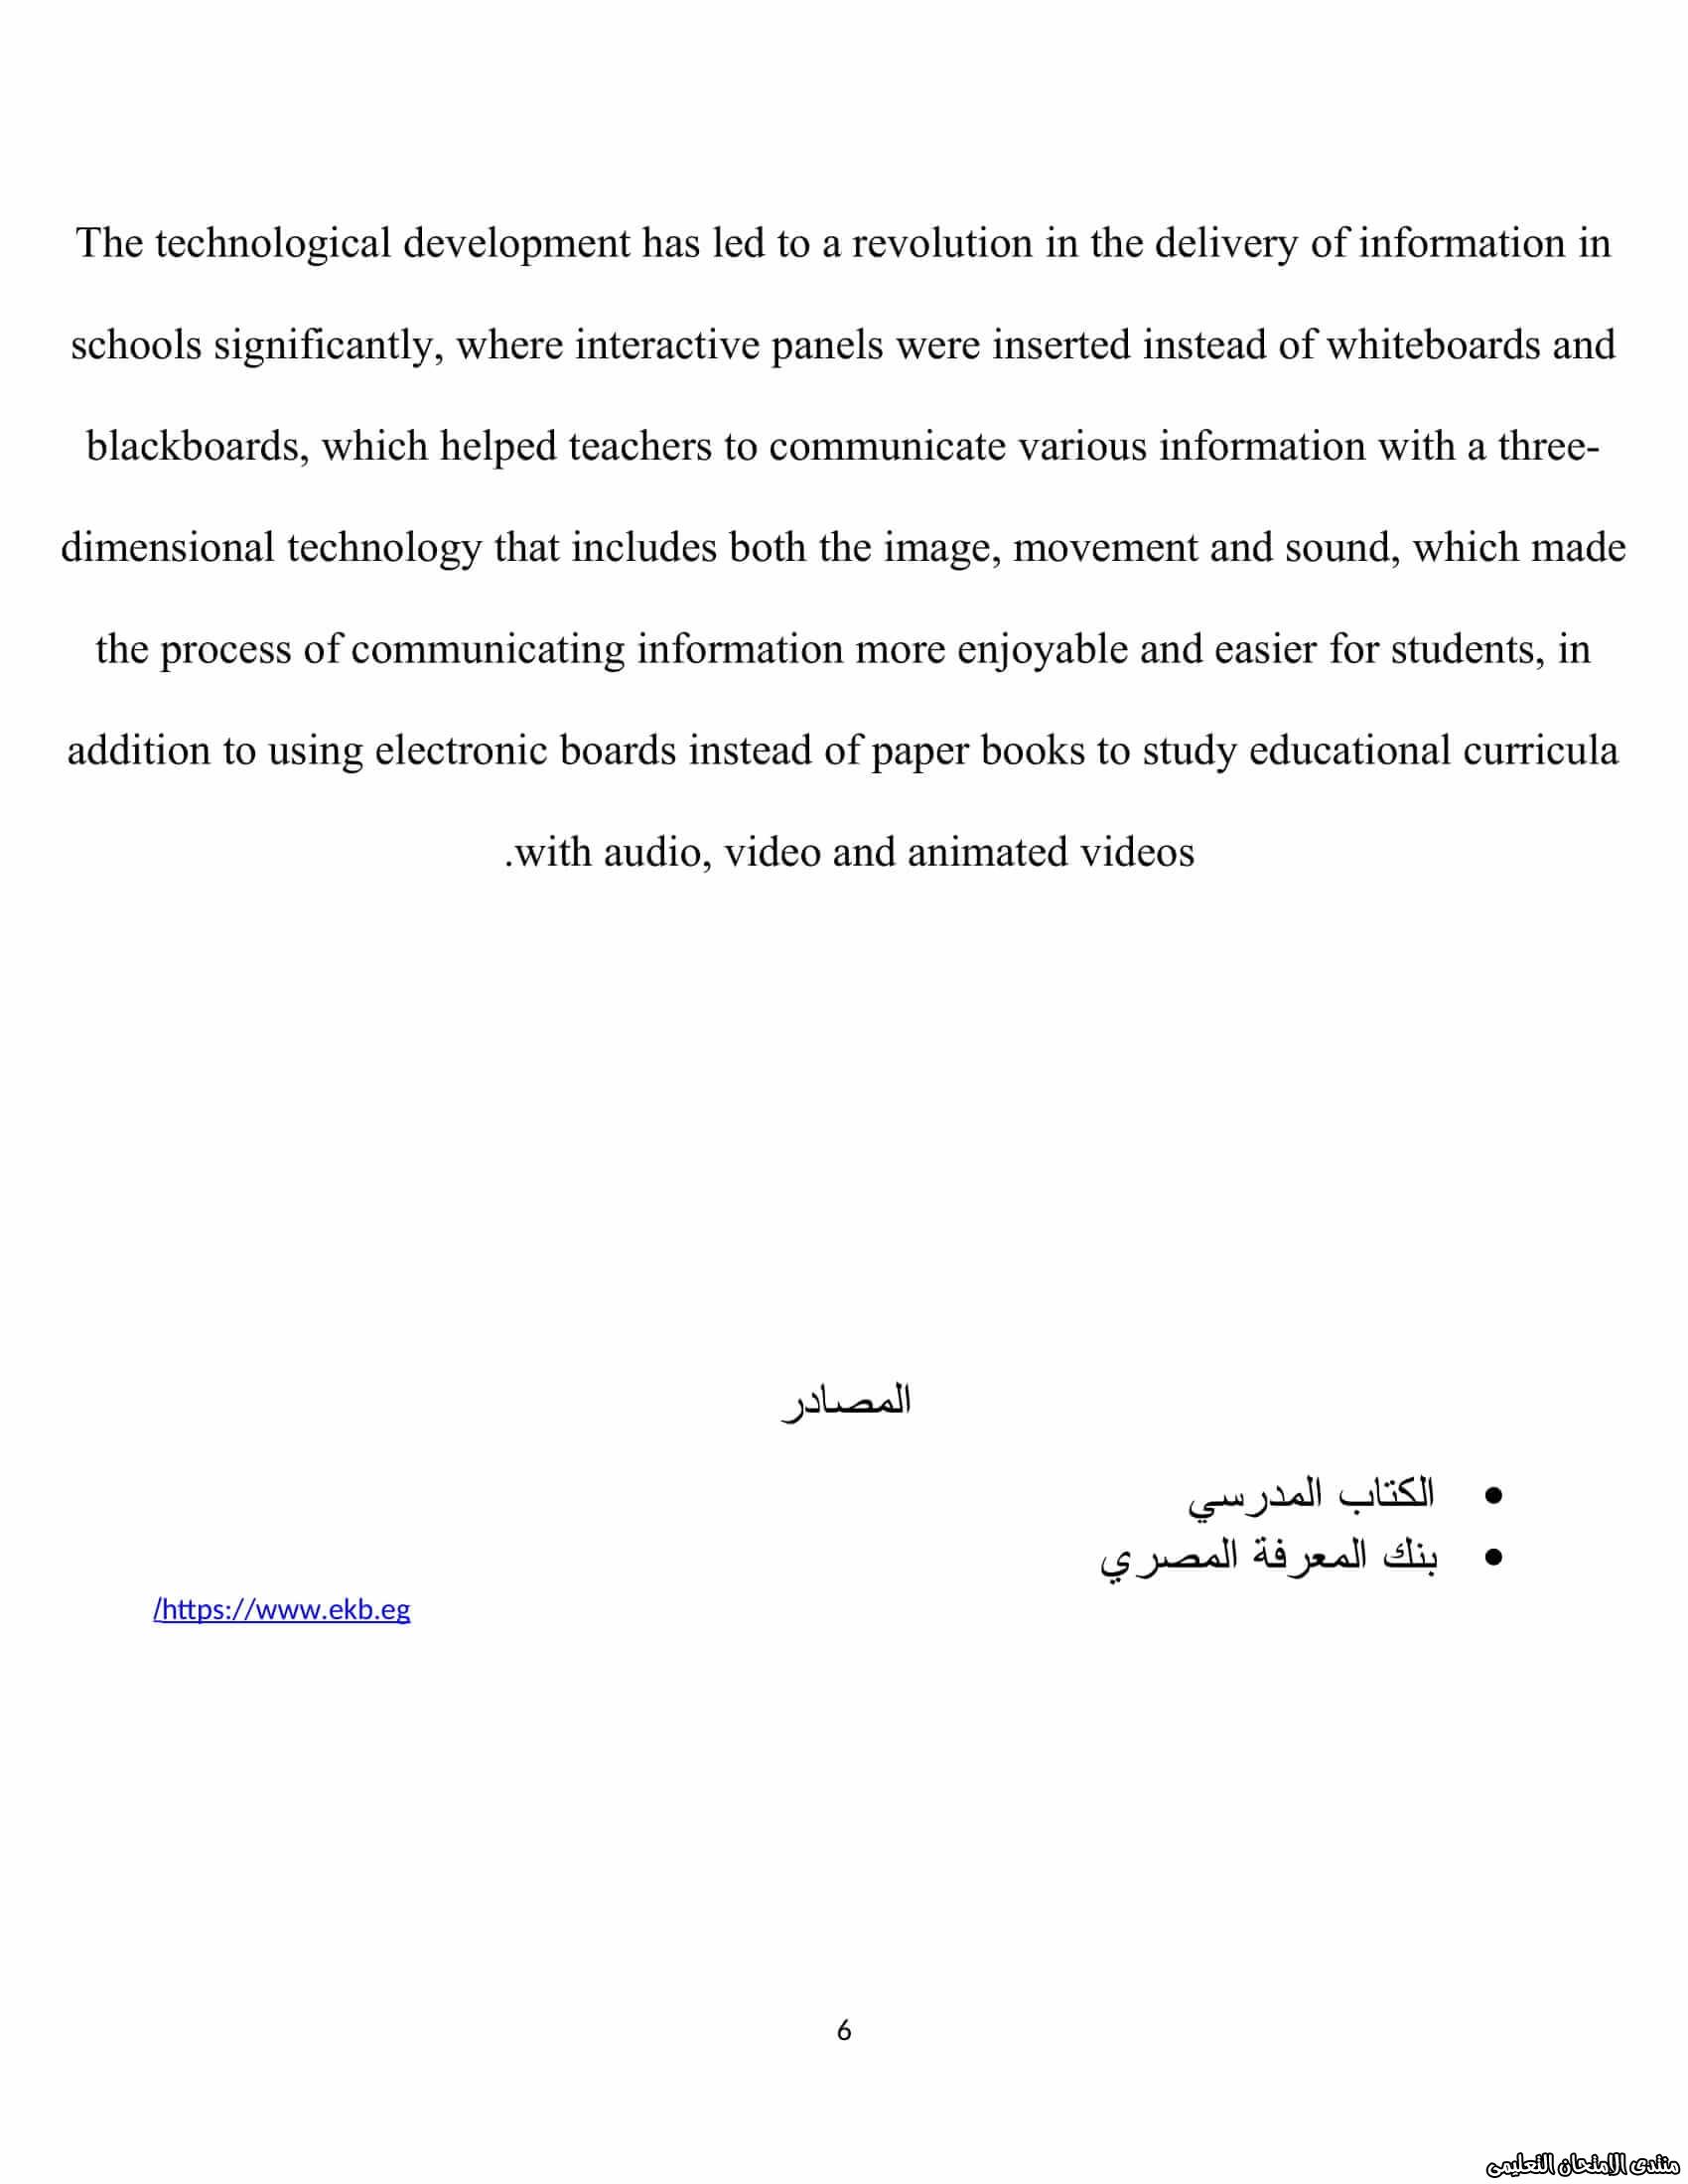 exam-eg.com_158817628921716.jpg